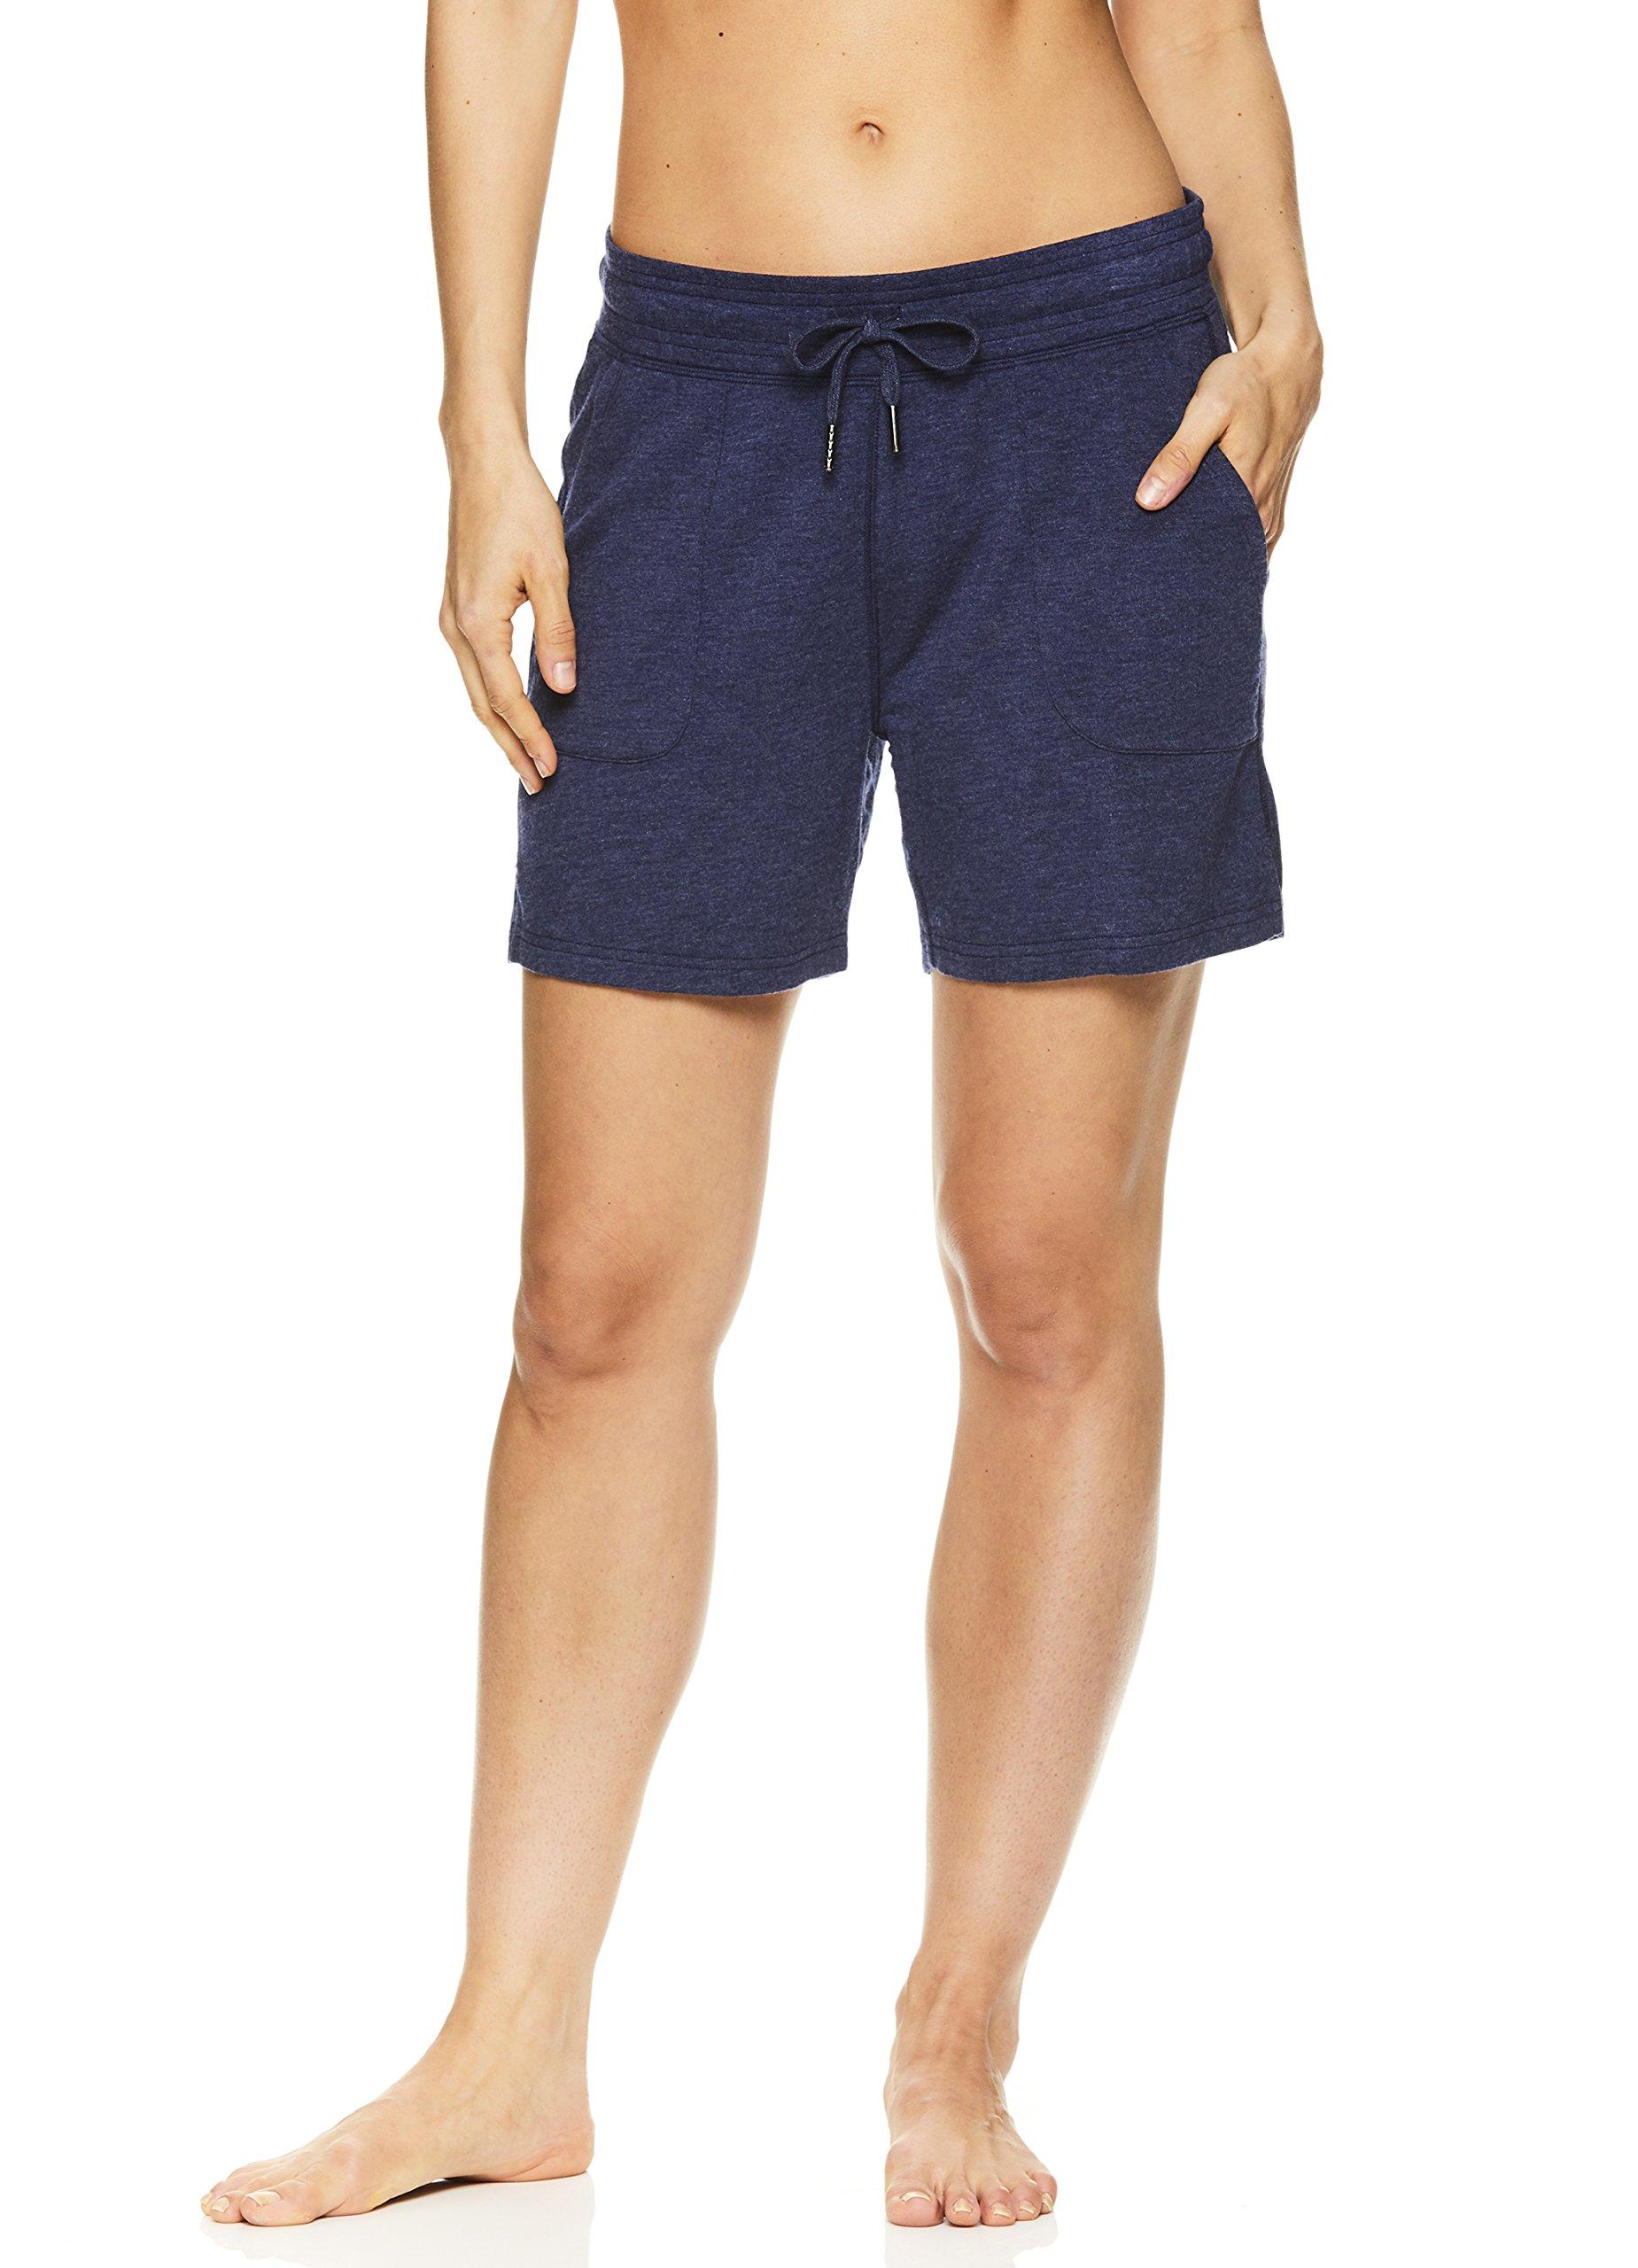 Gaiam Women's Warrior Yoga Short - Bike & Running Activewear Shorts w/Pockets - Medieval Blue Heather, 1X